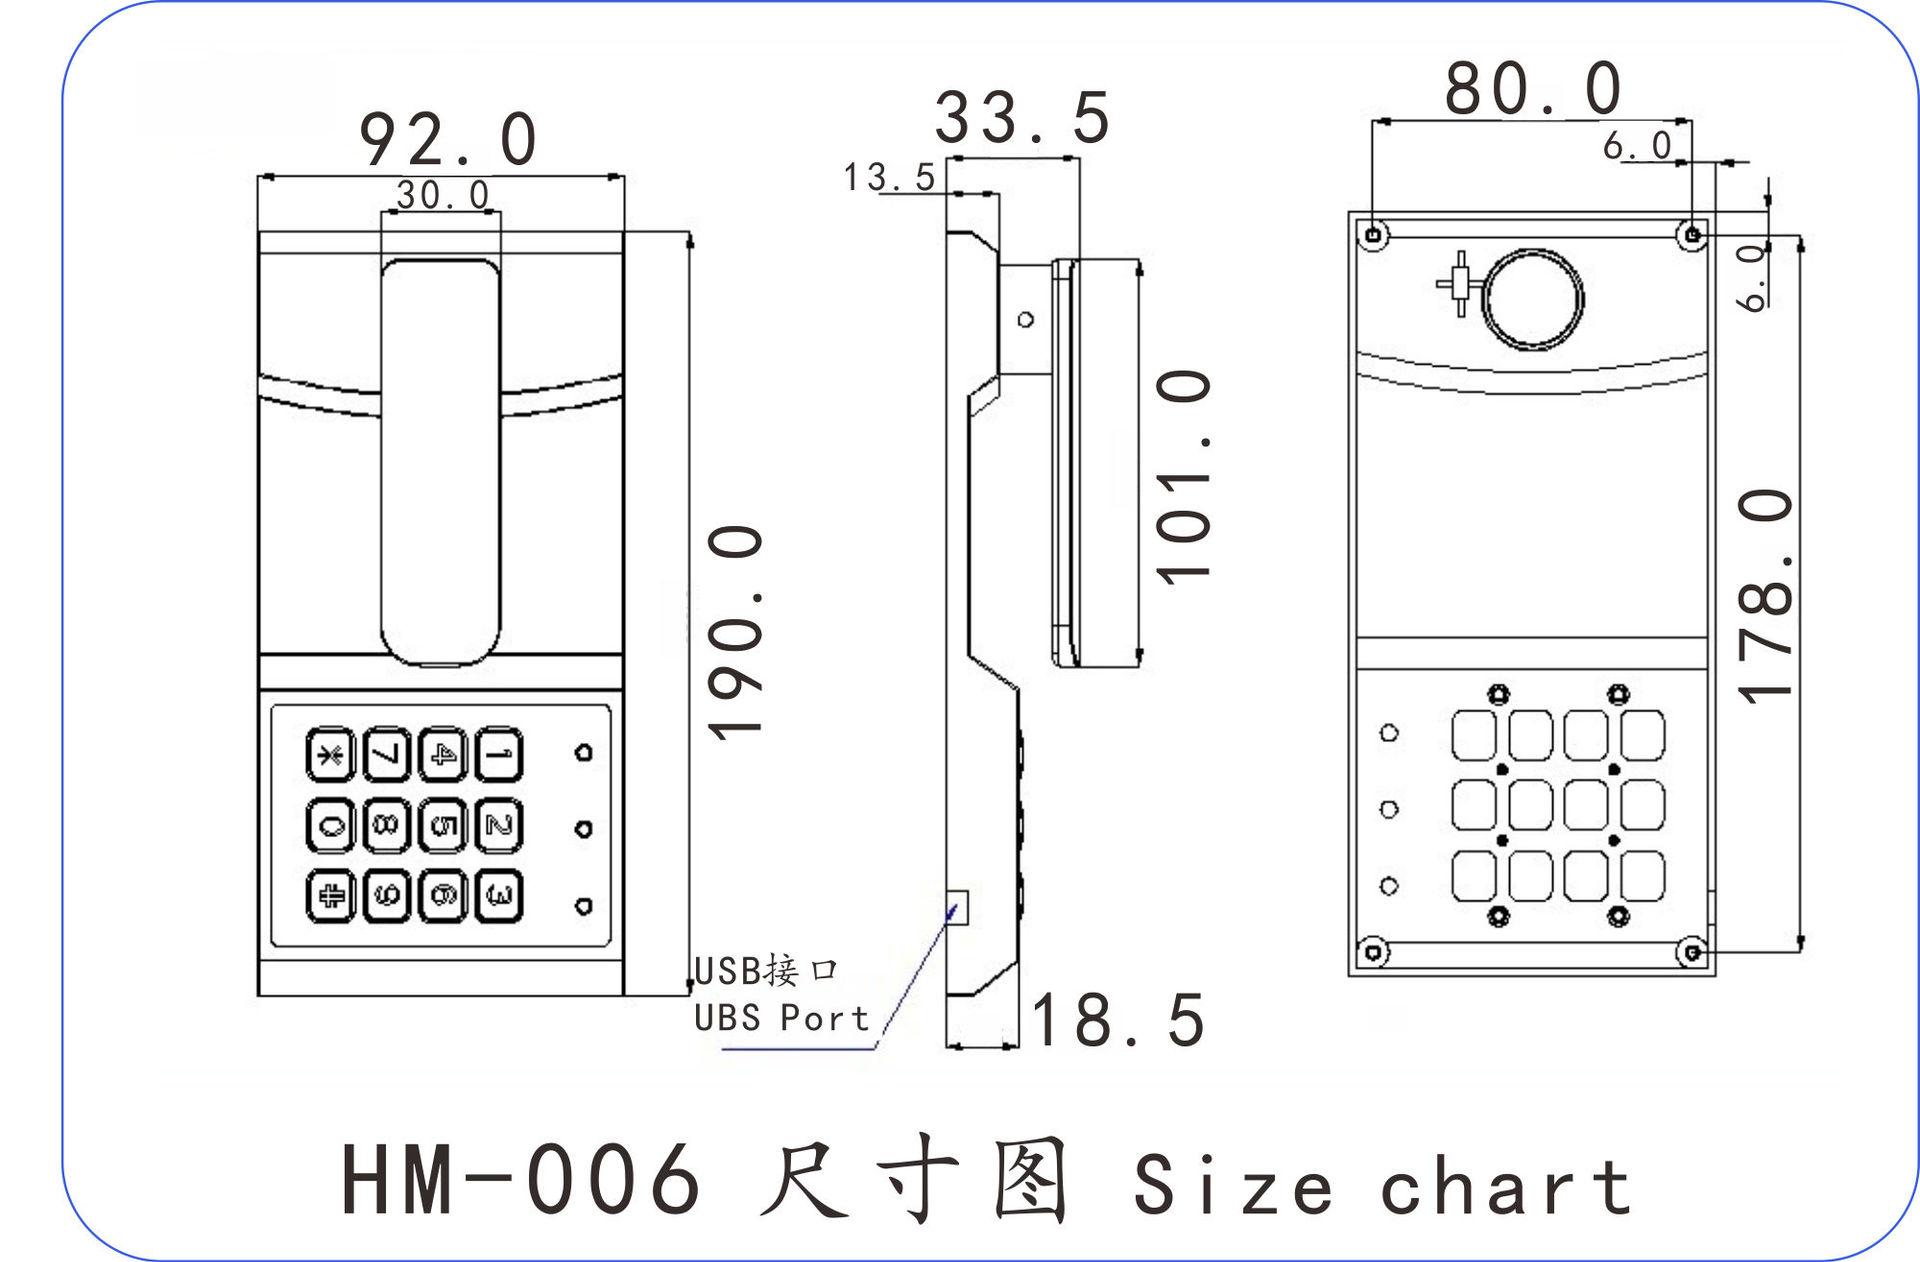 HM-006 尺寸图.jpg